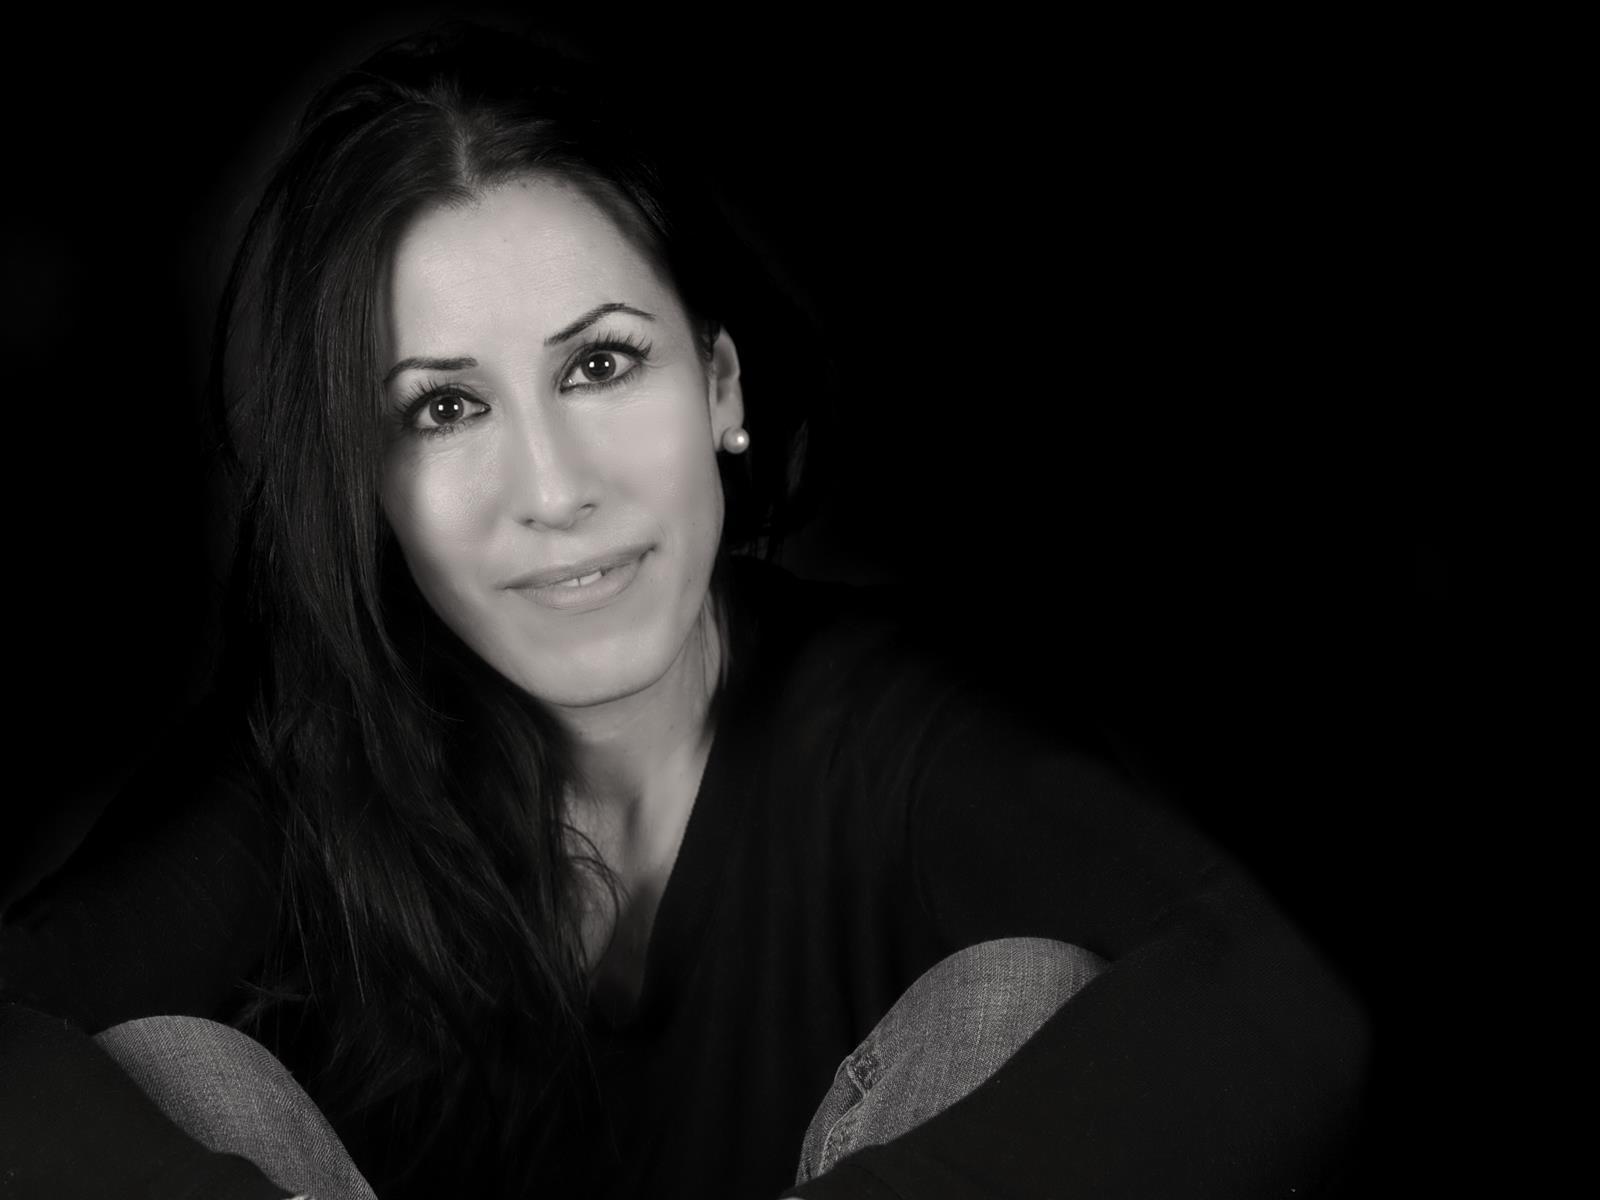 Yolanda Velilla